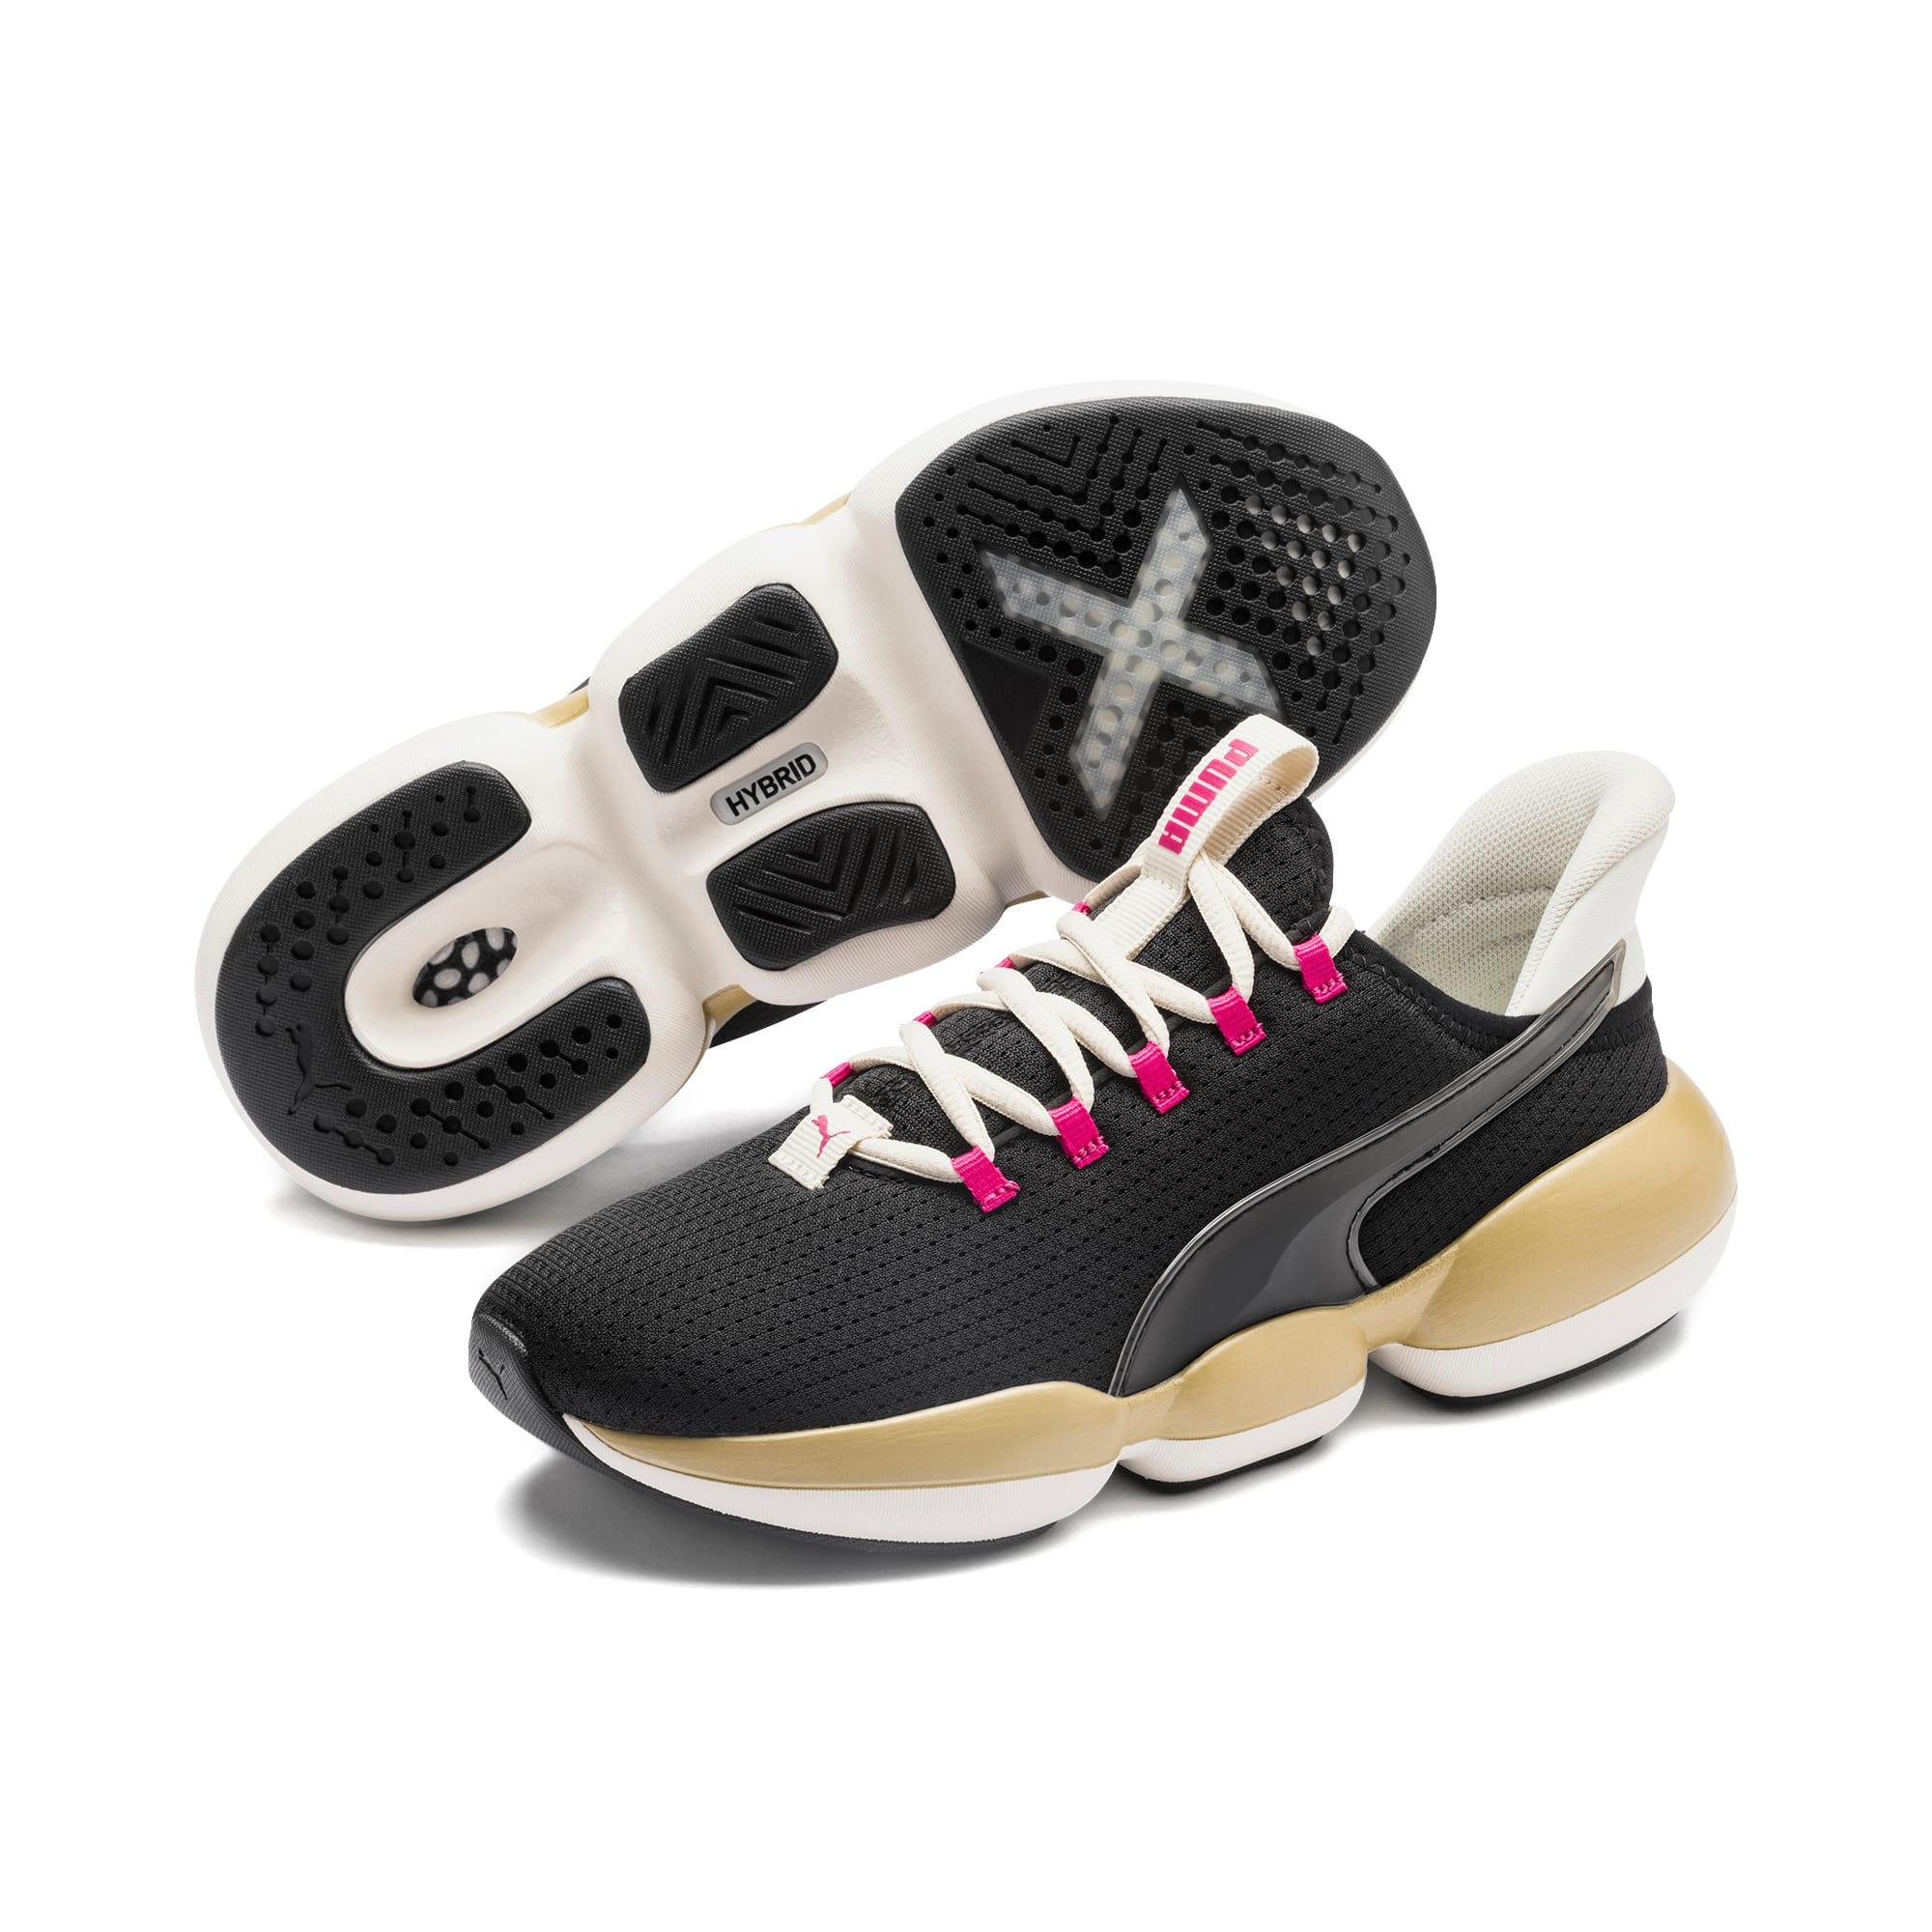 Thumbnail 2 of Mode XT Sweet Damen Sneaker, Black- White-Purple, medium